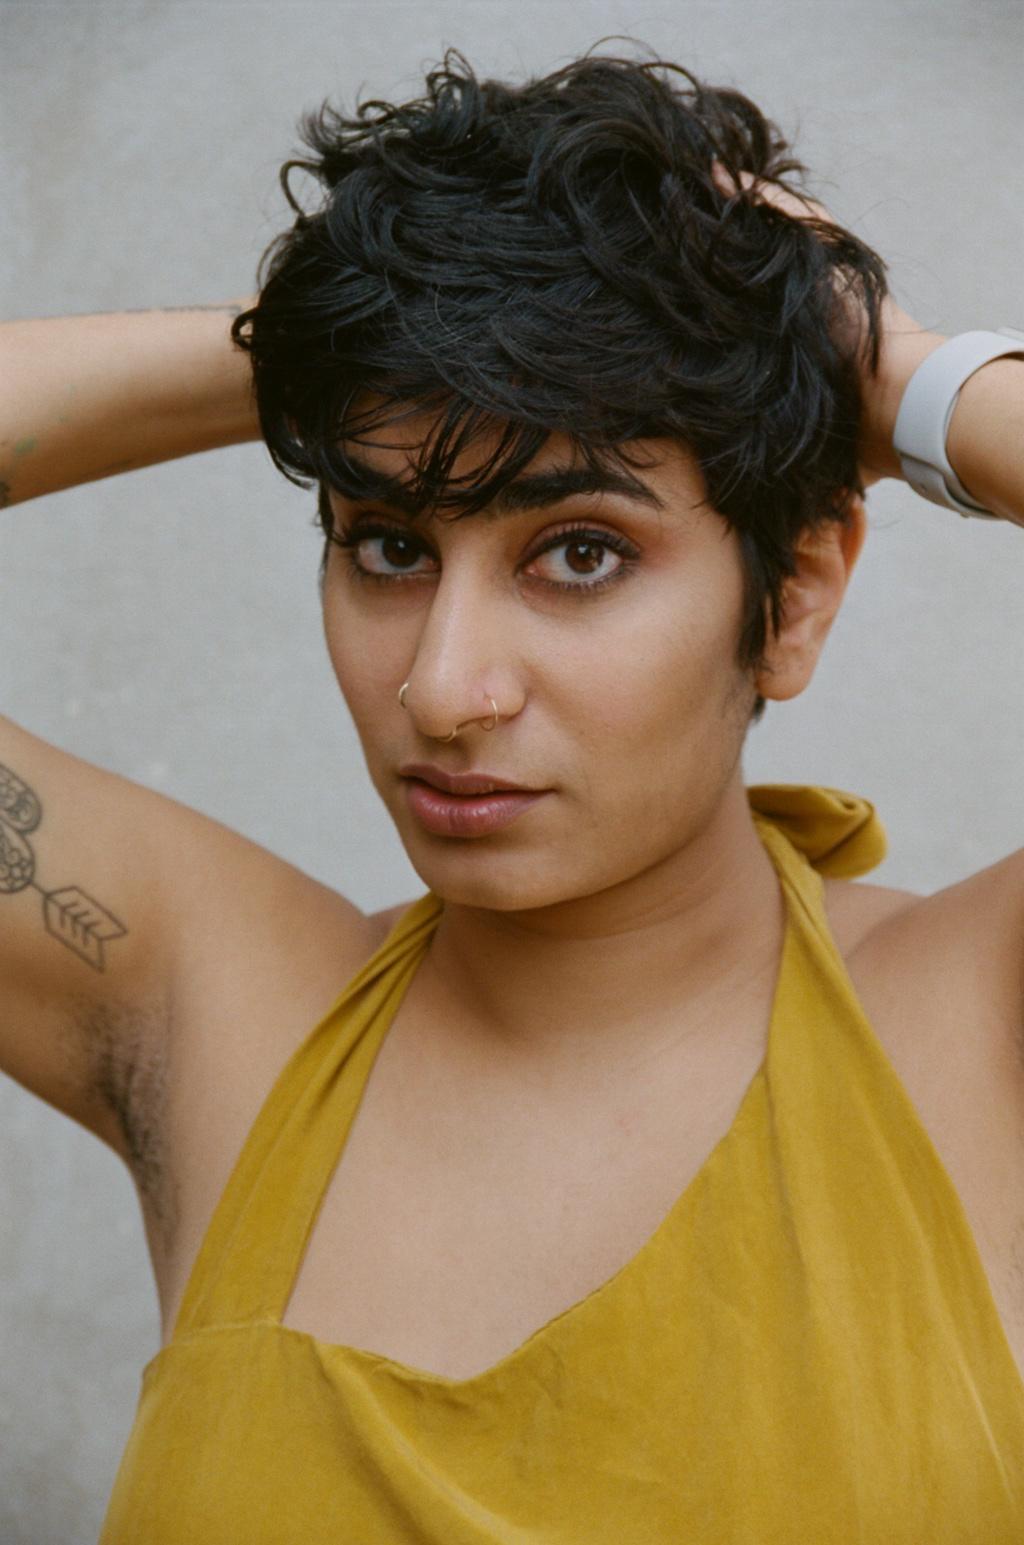 Fatimah Asghar by Allie Madden.JPG